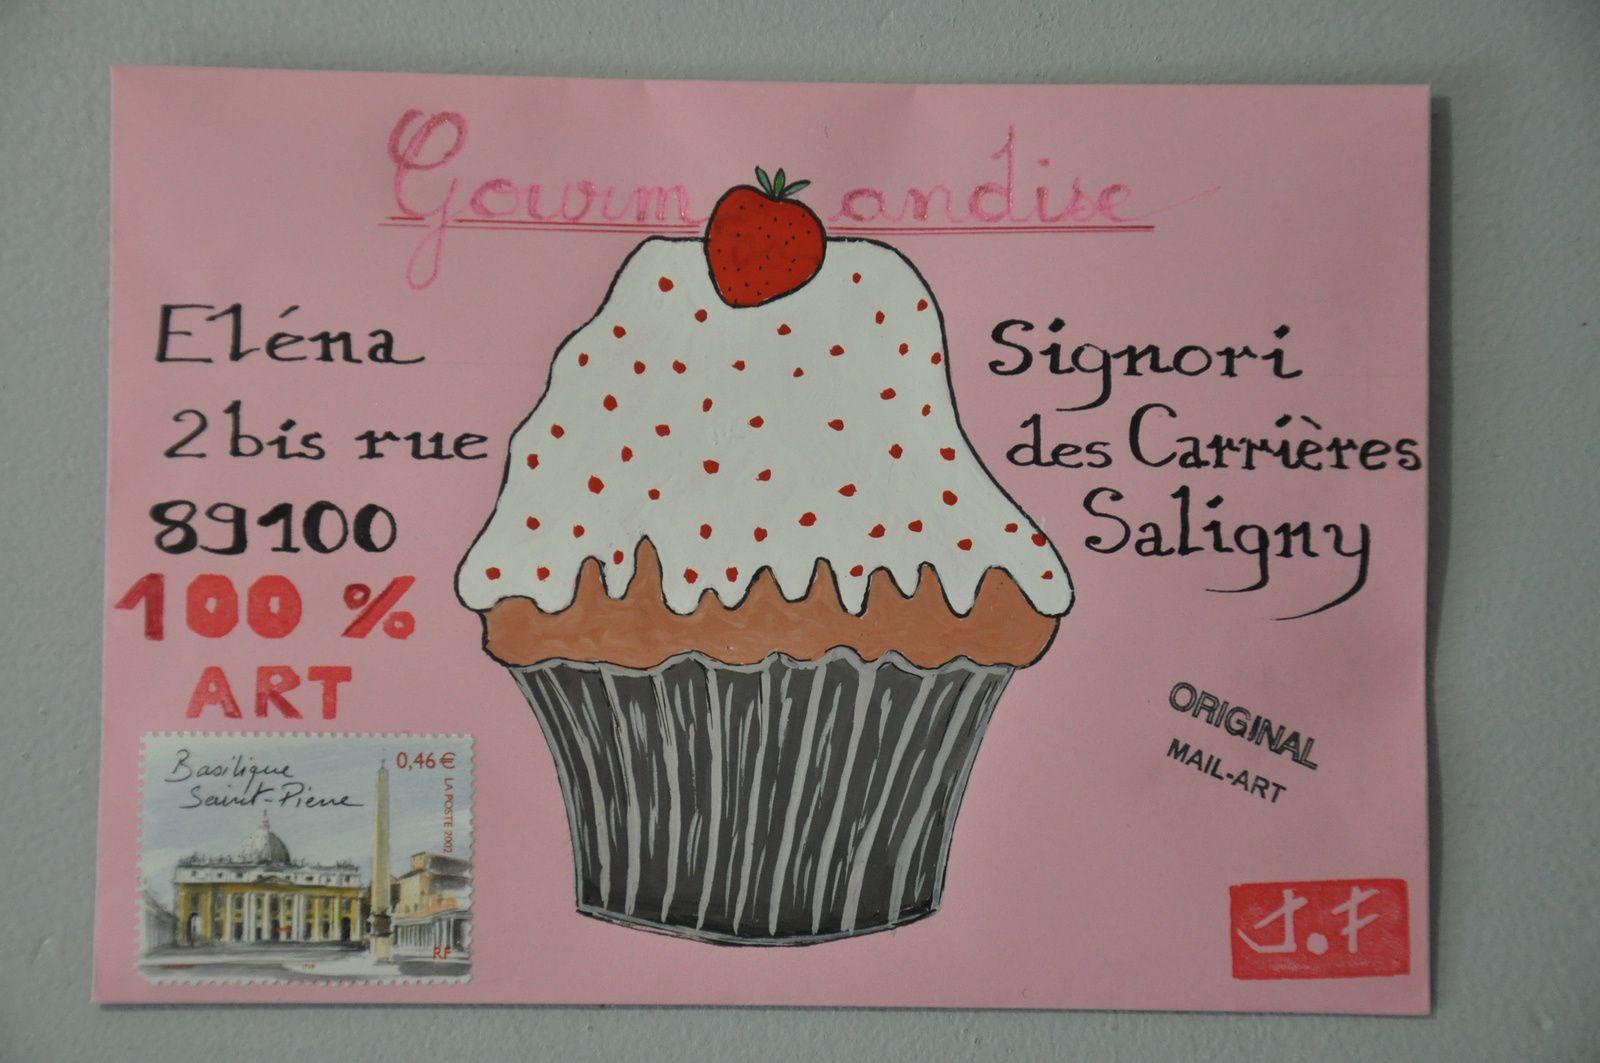 Pour Elena Signori, une petite gourmandise à la gouache!